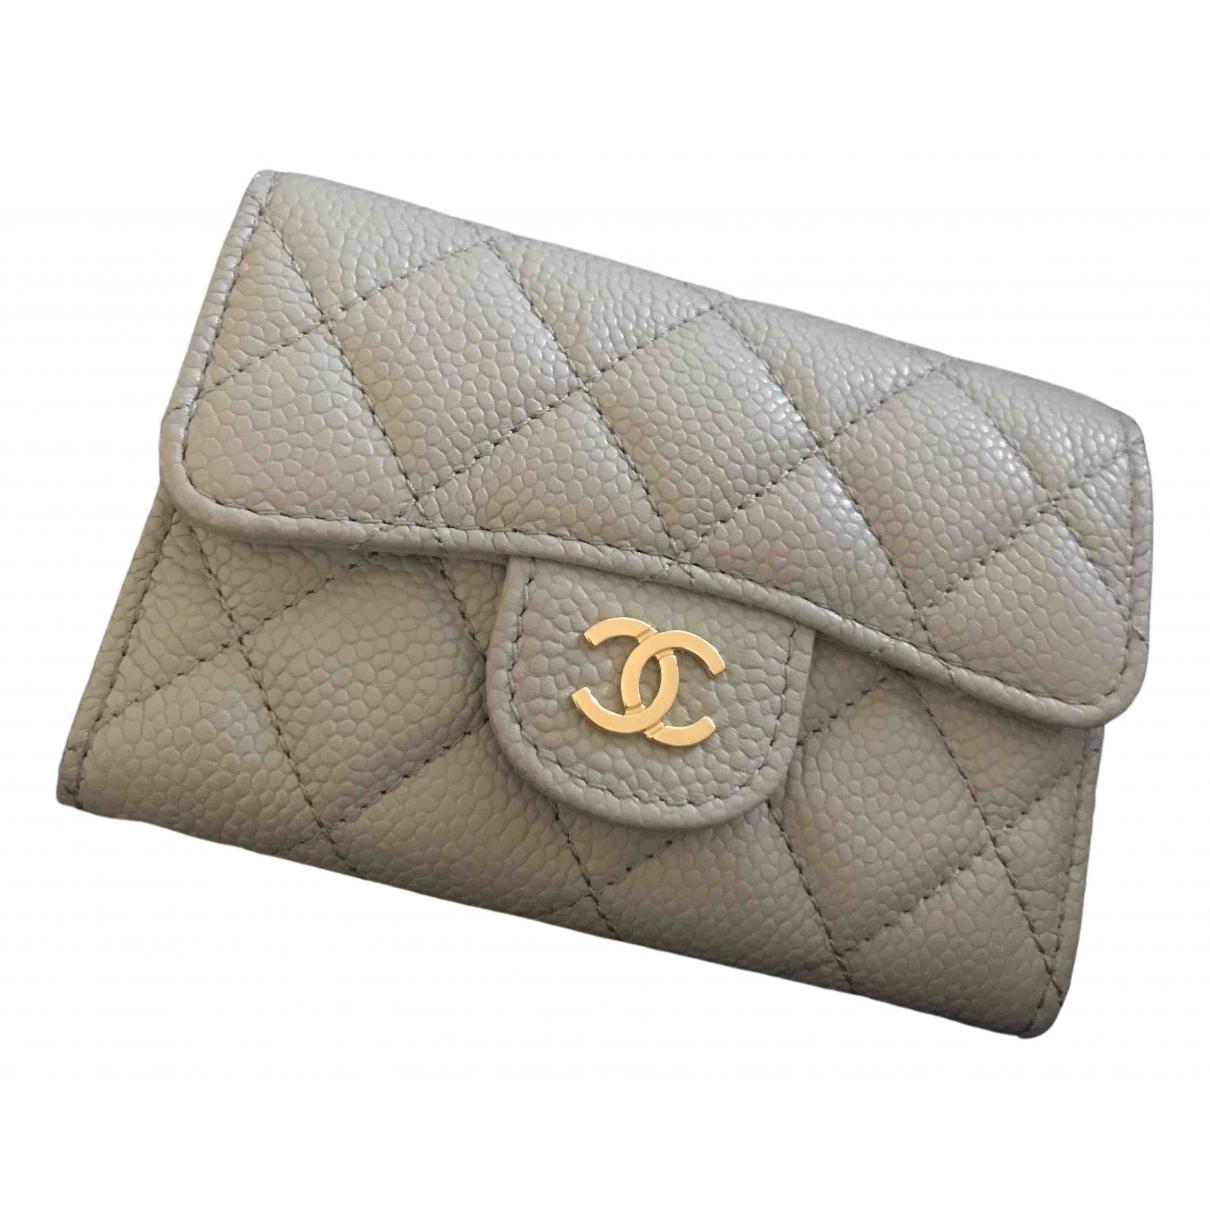 Cartera Timeless/Classique de Cuero Chanel